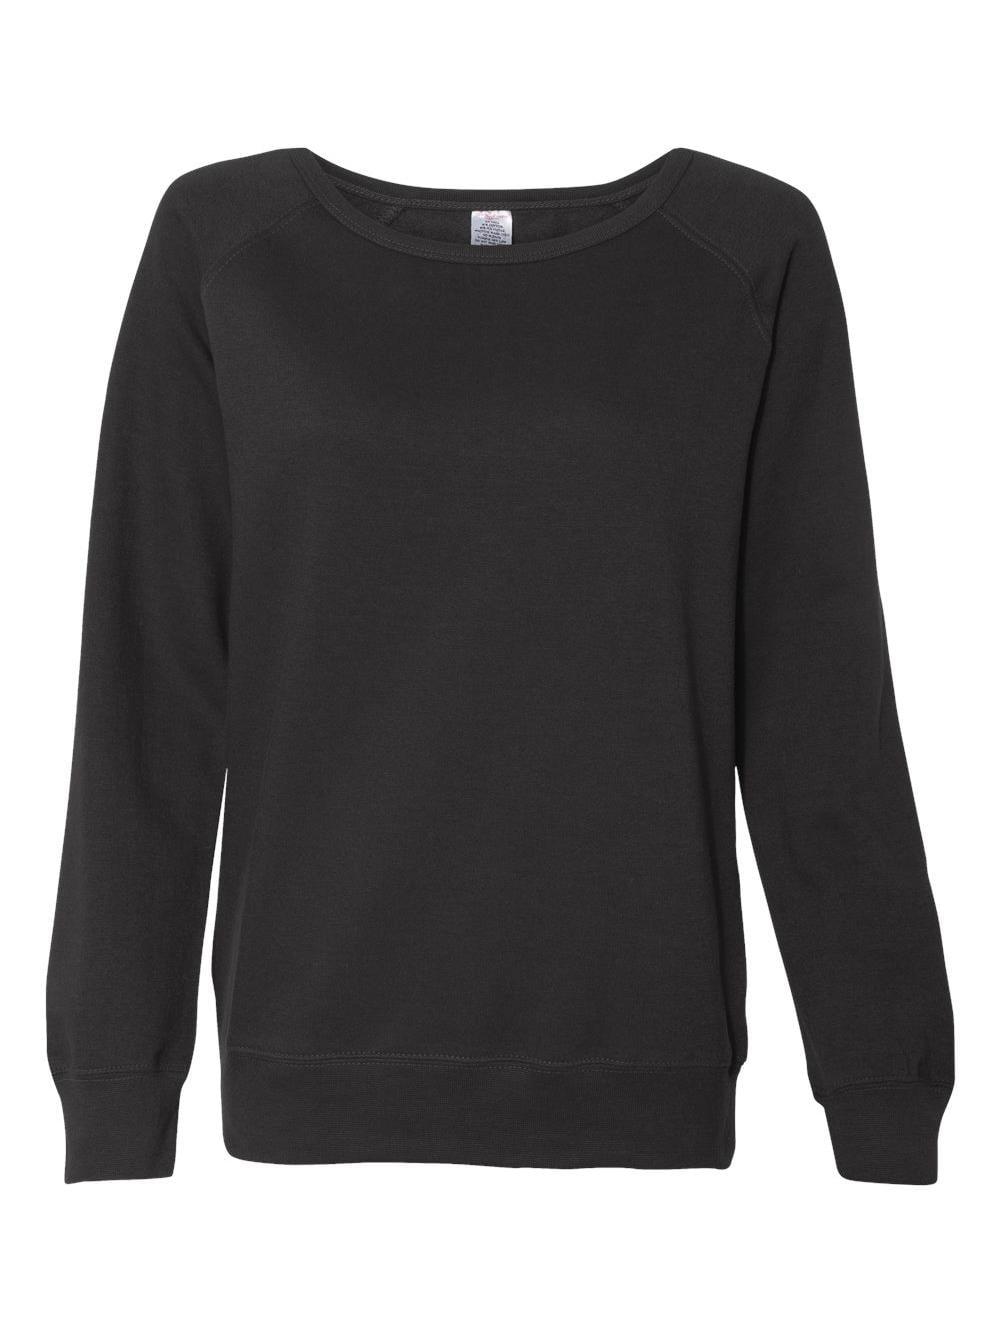 Independent Trading Co. Junior's Lightweight Crewneck Sweatshirt